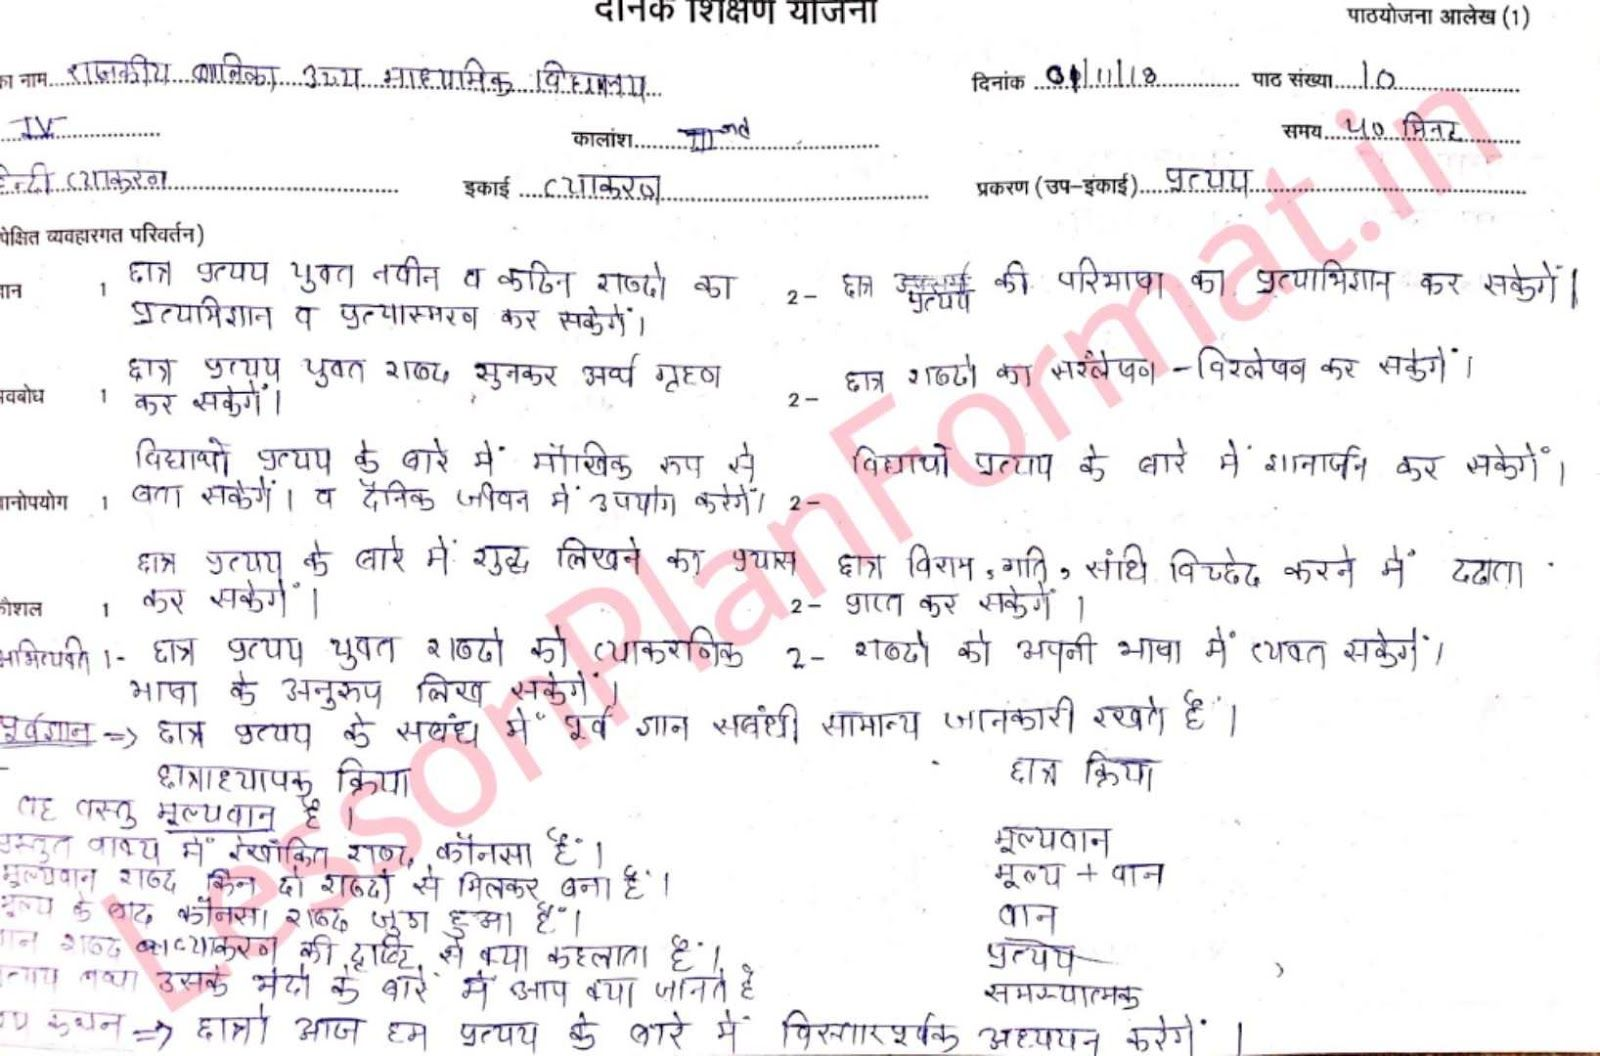 Hindi Vyakaran Pratyay Lesson Plan Lesson Plan In Hindi How To Plan Grammar Lesson Plans [ 1056 x 1600 Pixel ]